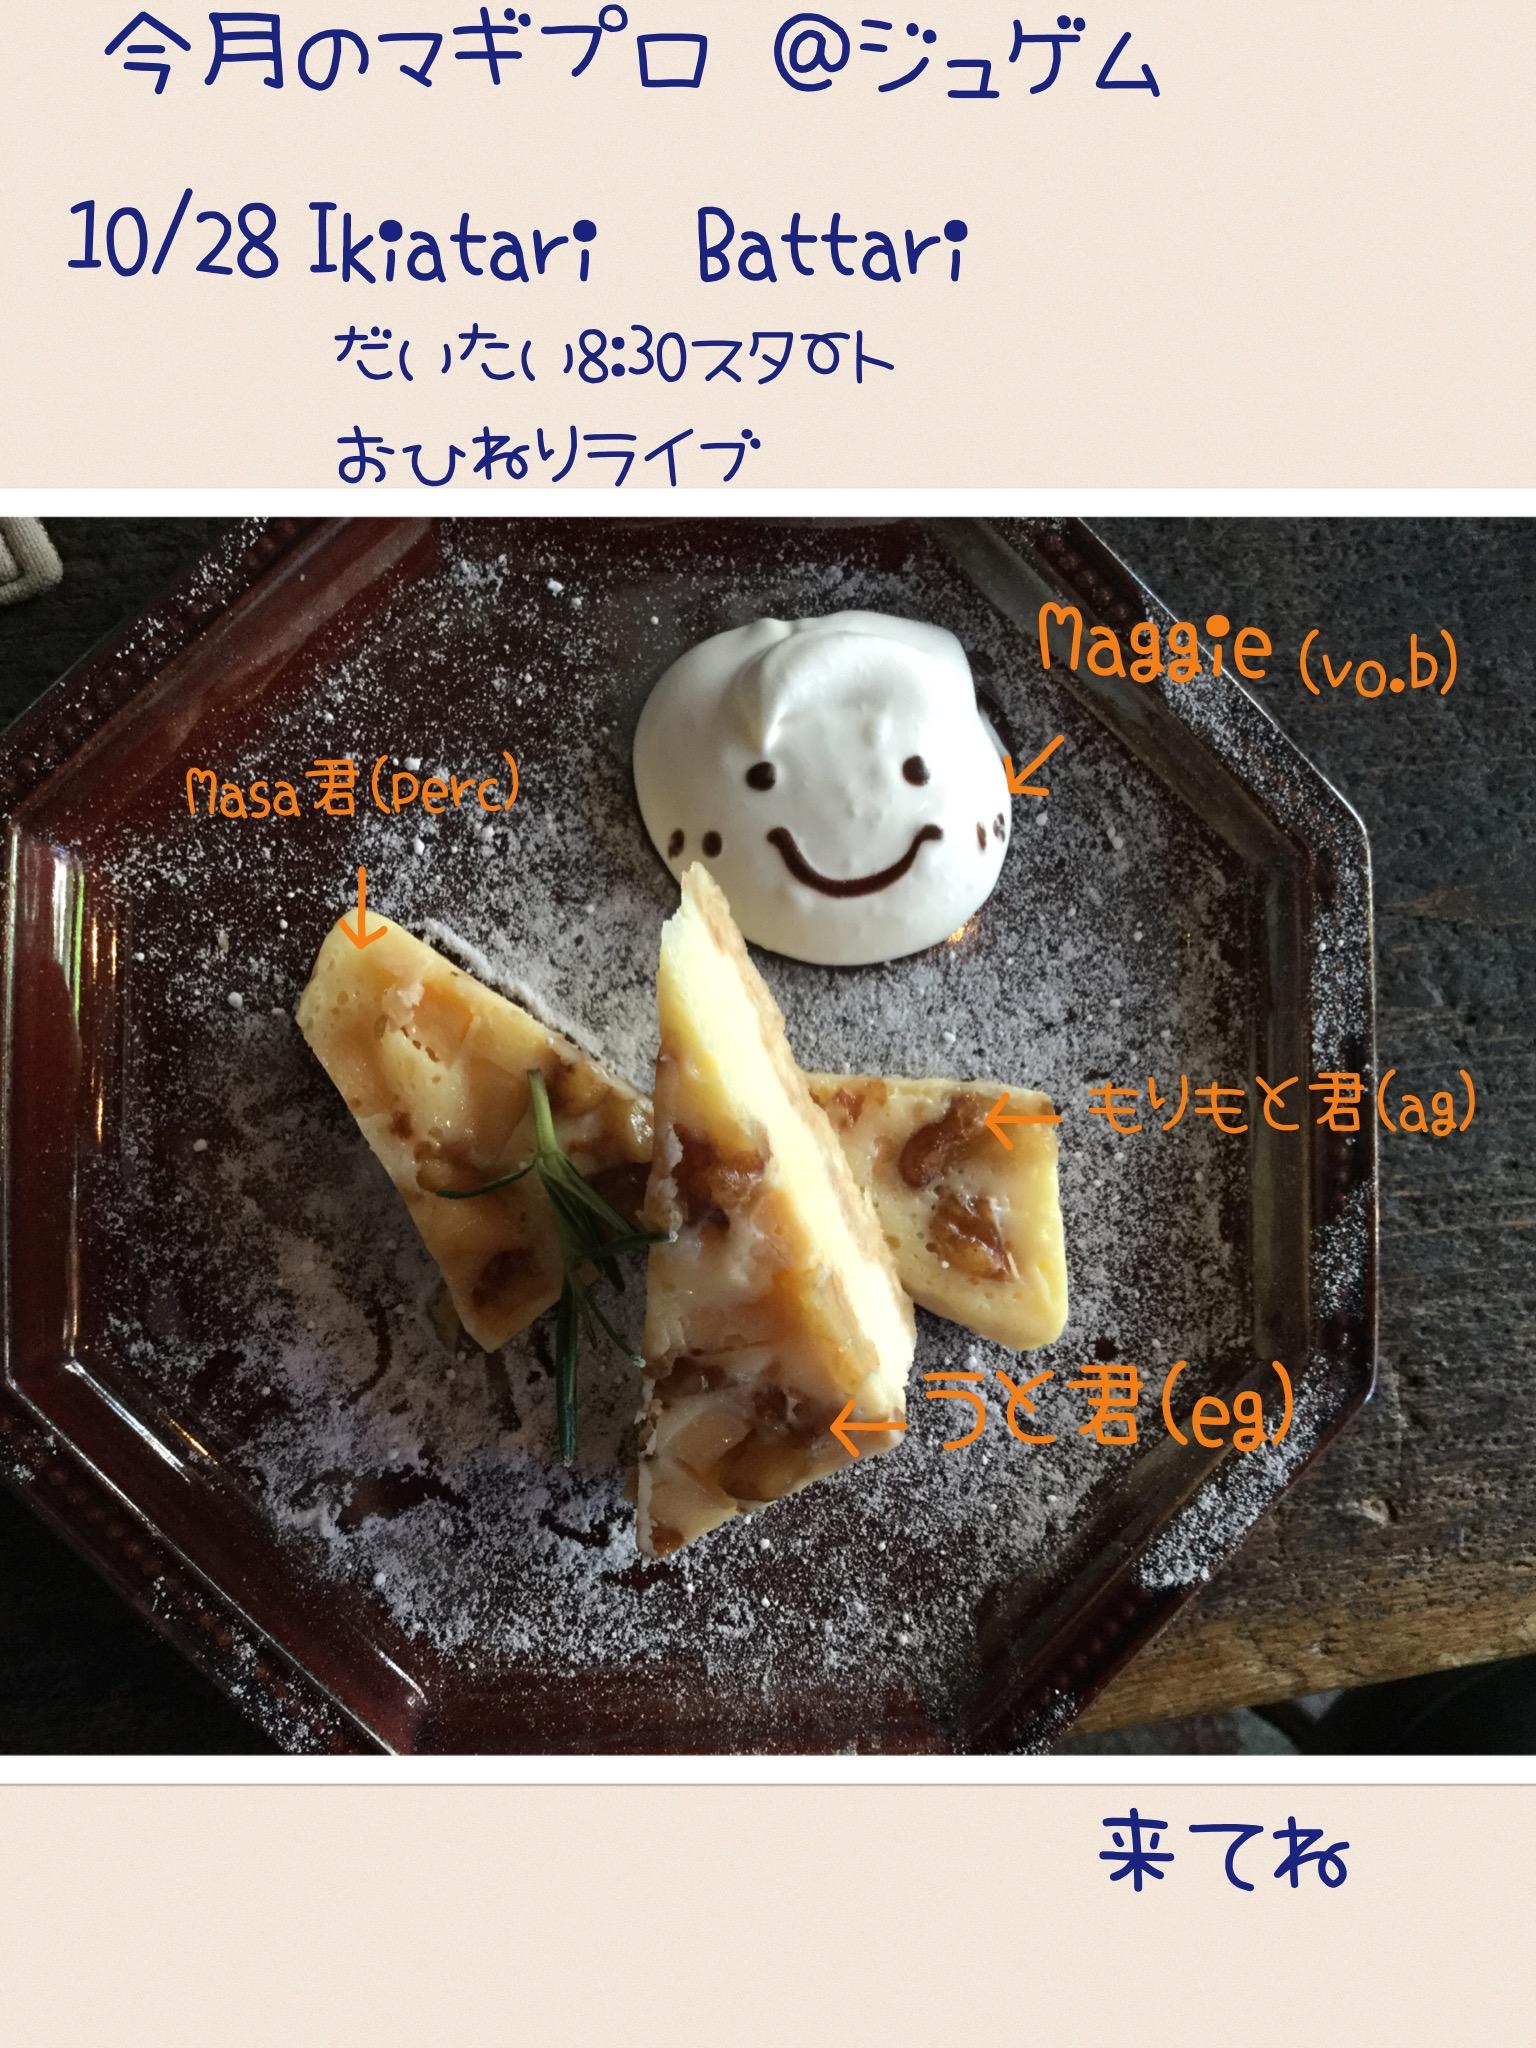 image1-7.jpg